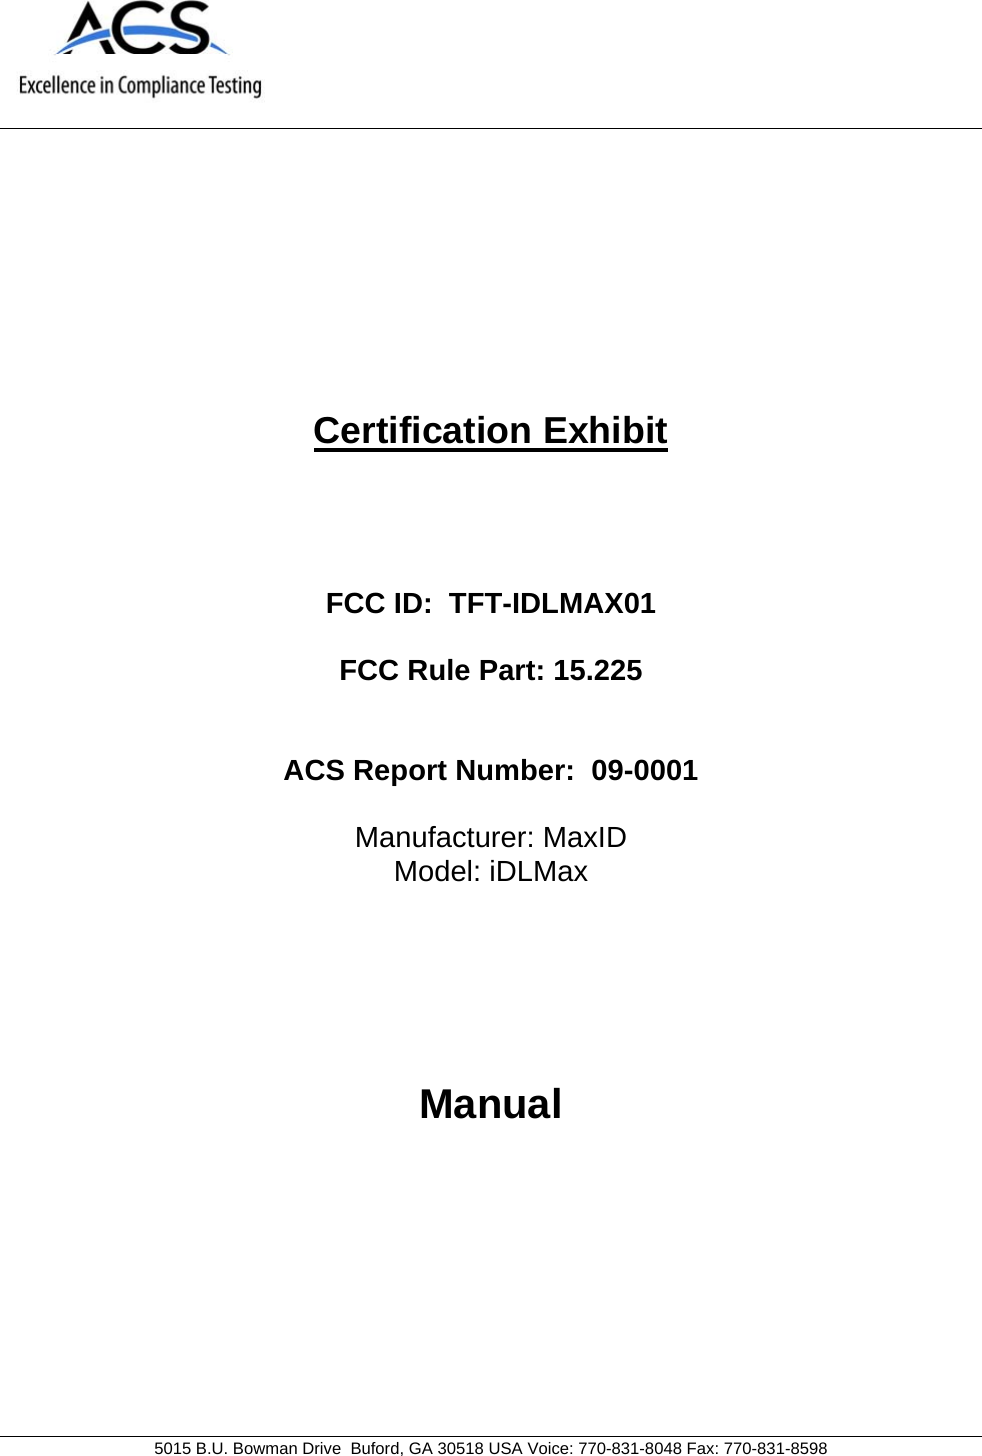 Maxid idlmax01 idlmax mobile computing device user manual manual xflitez Gallery